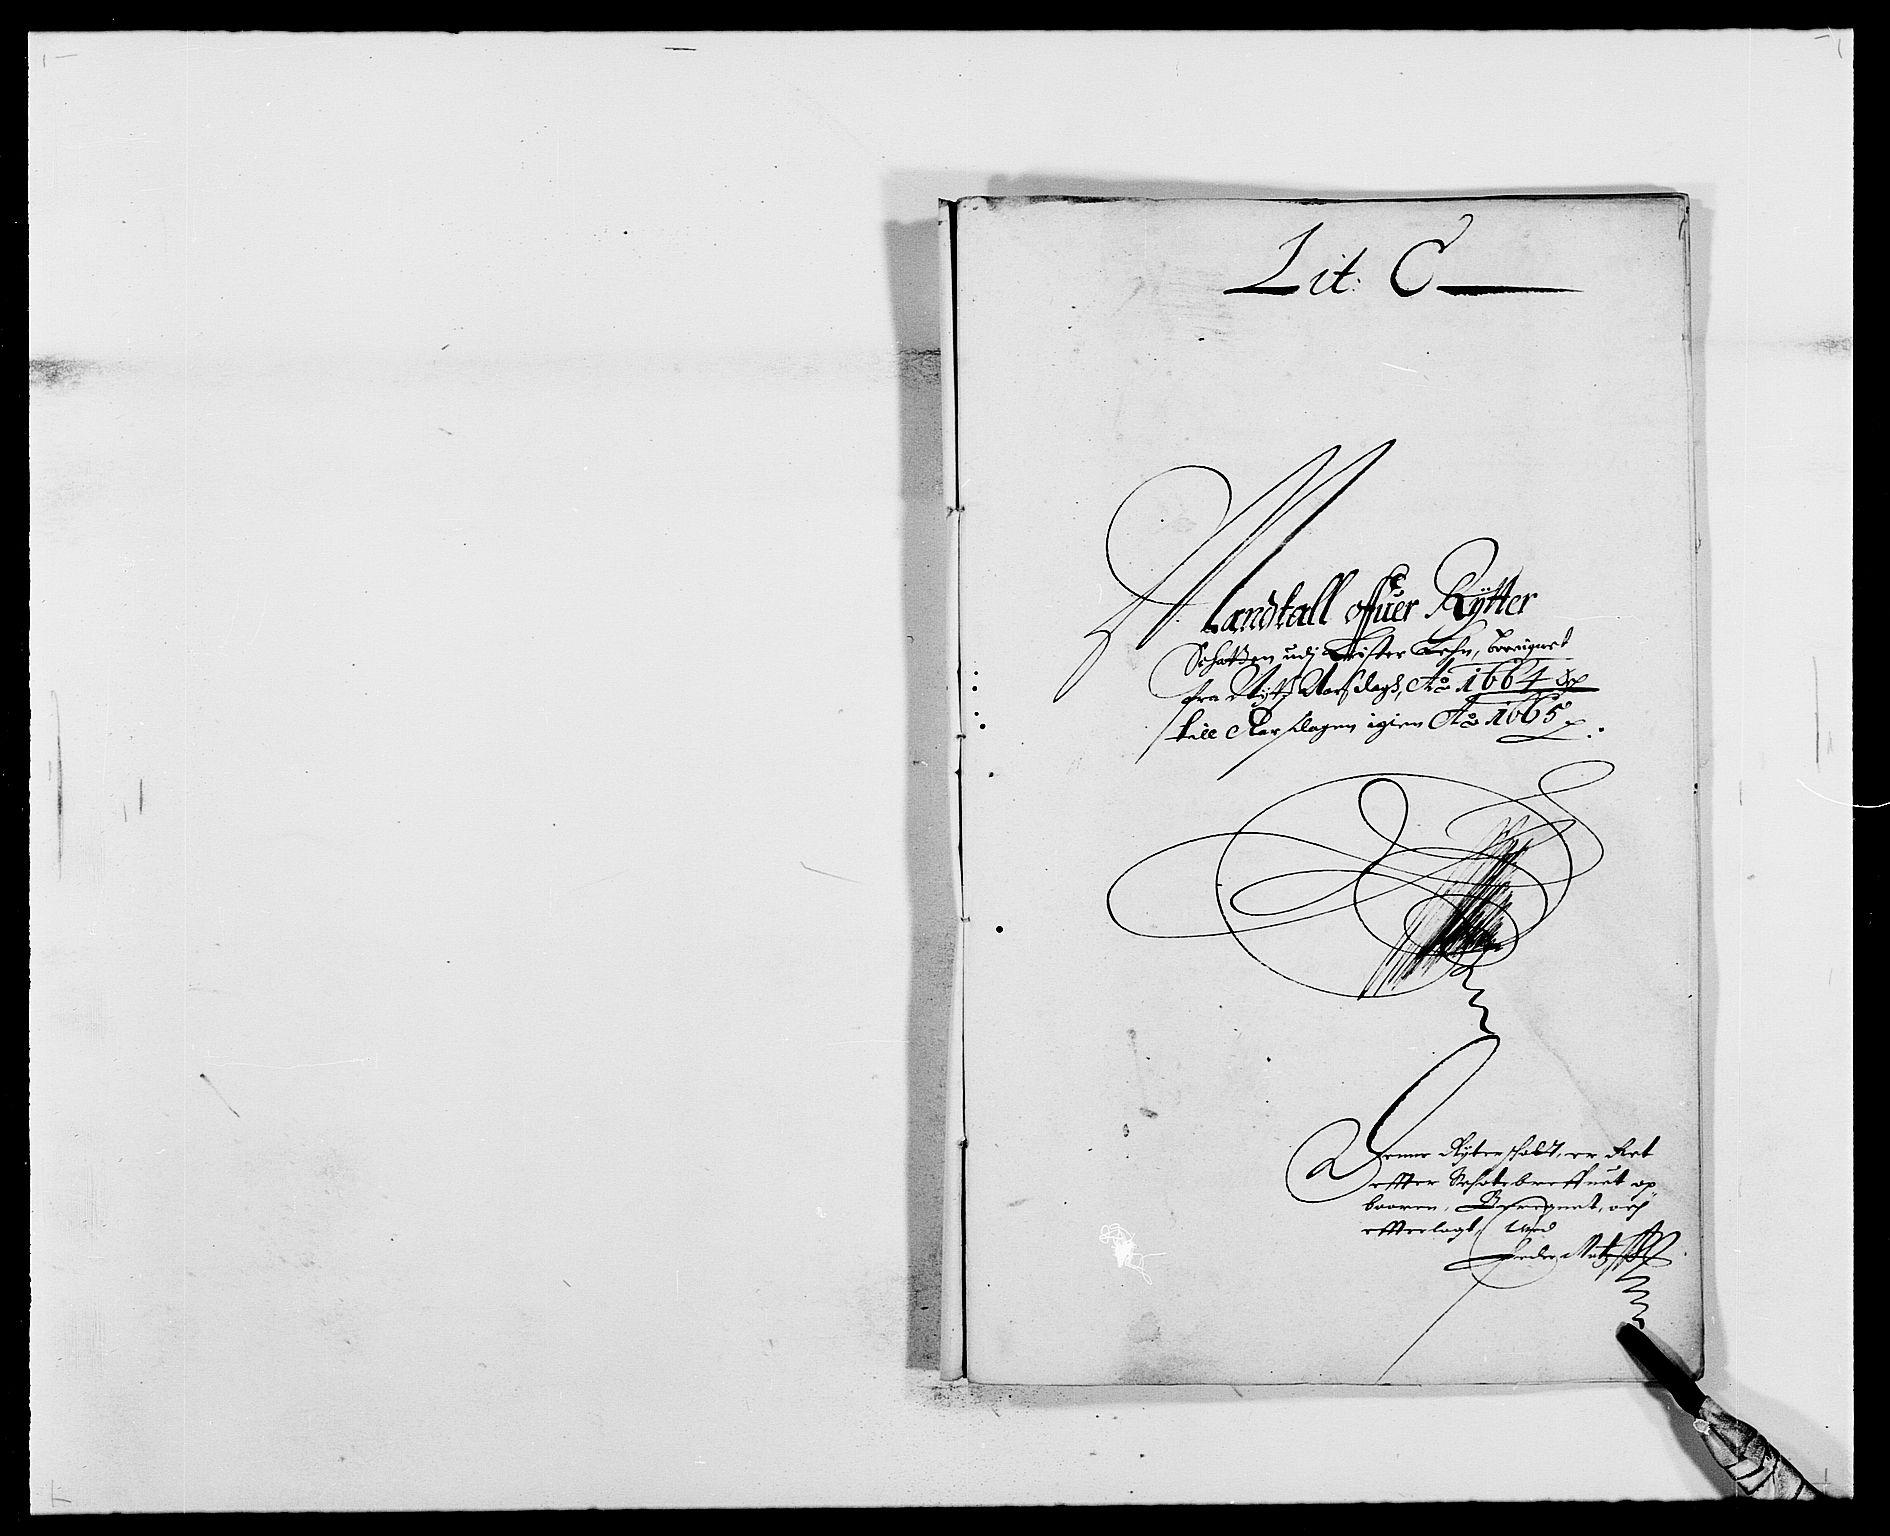 RA, Rentekammeret inntil 1814, Reviderte regnskaper, Fogderegnskap, R41/L2523: Fogderegnskap Lista, 1663-1664, s. 239